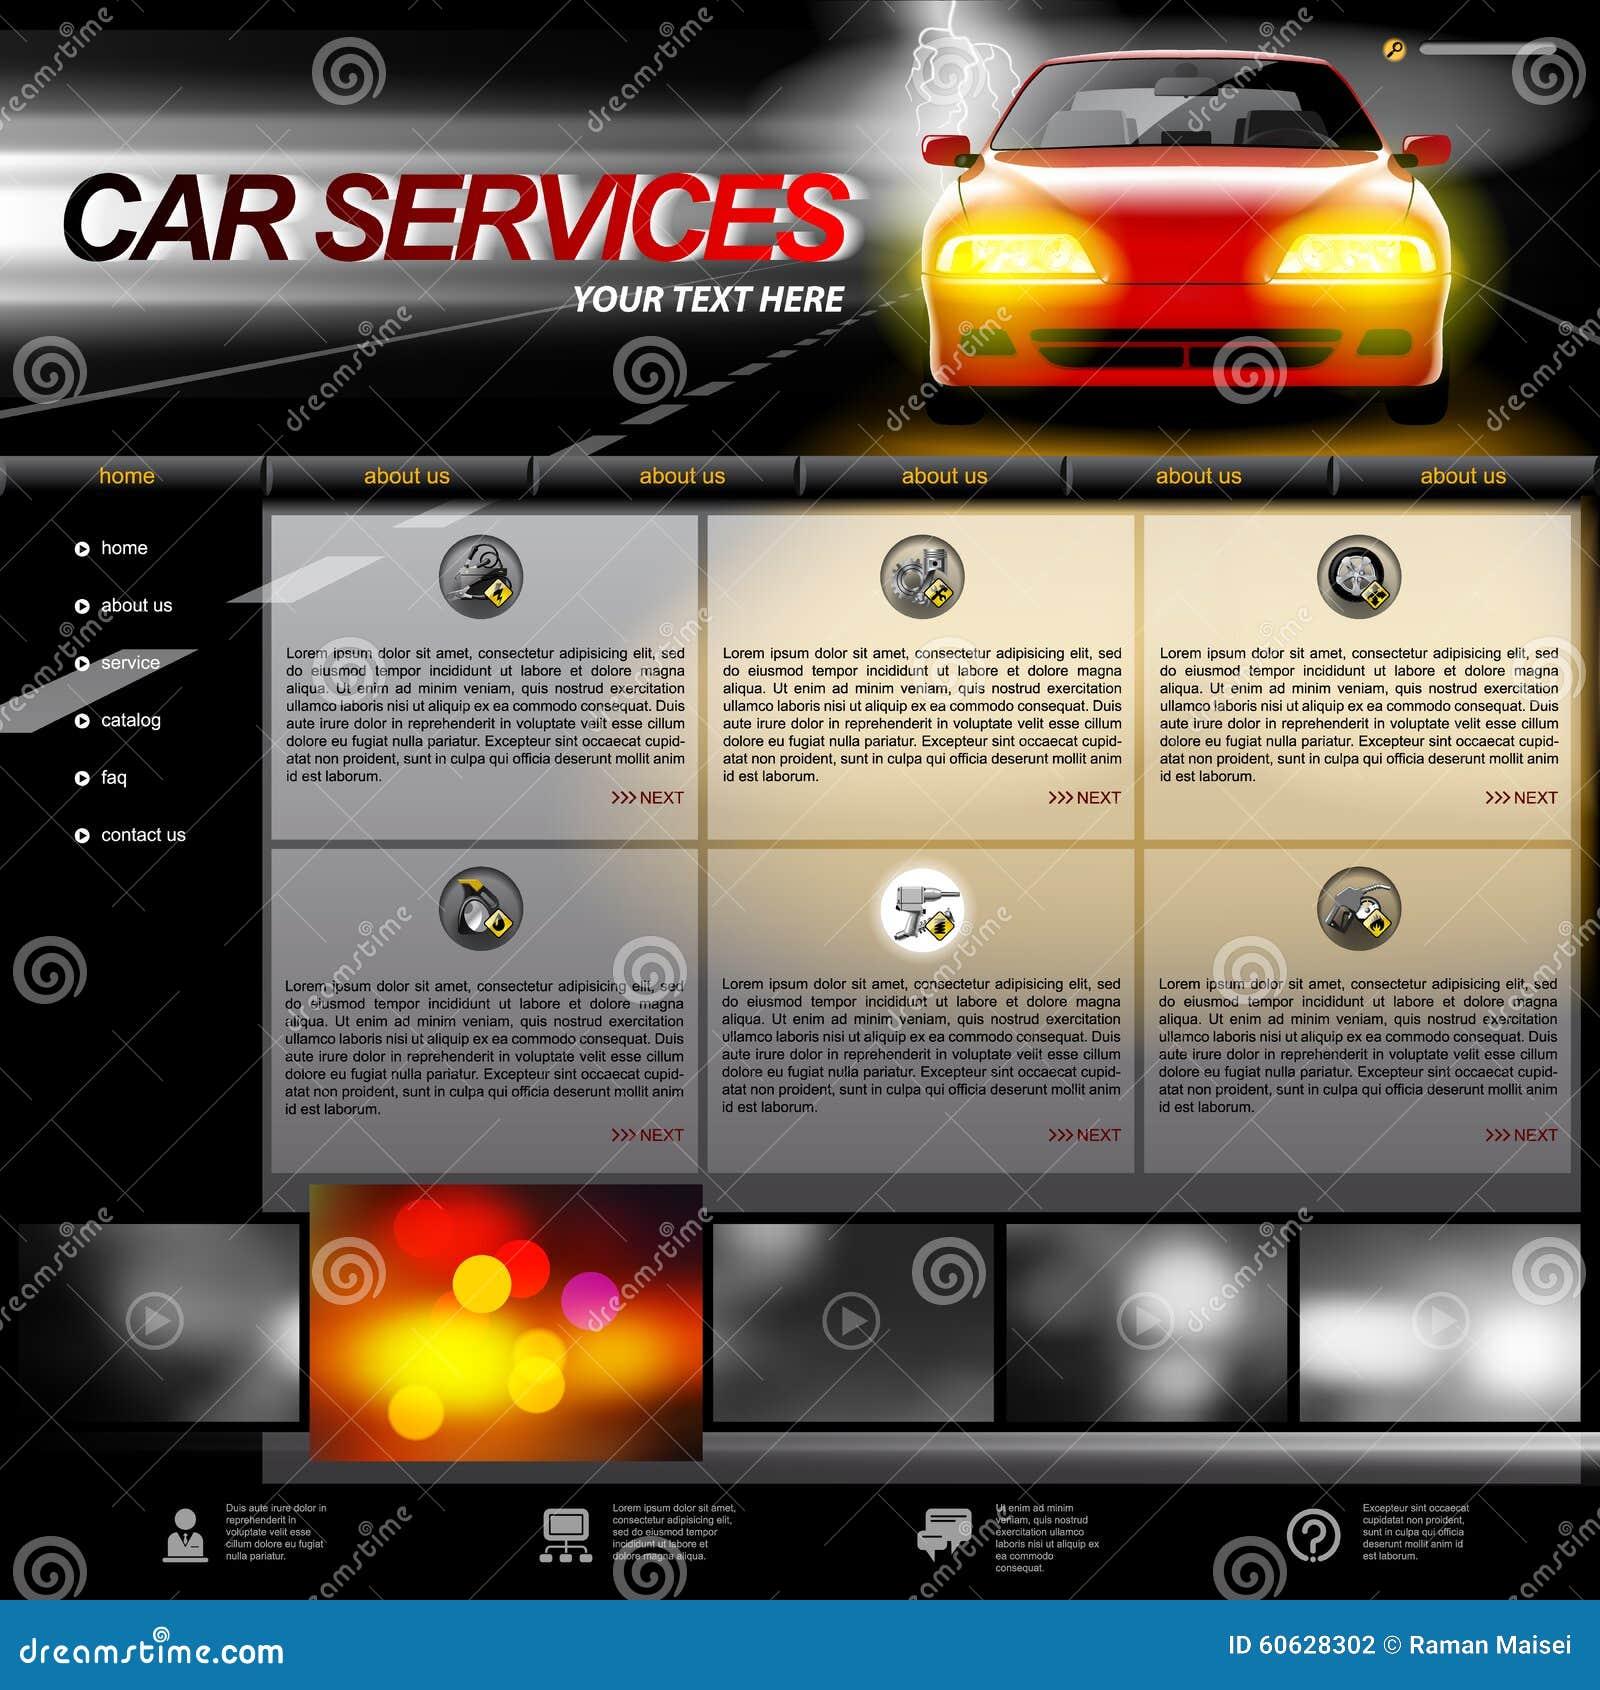 automobile service website template stock vector image 60628302. Black Bedroom Furniture Sets. Home Design Ideas